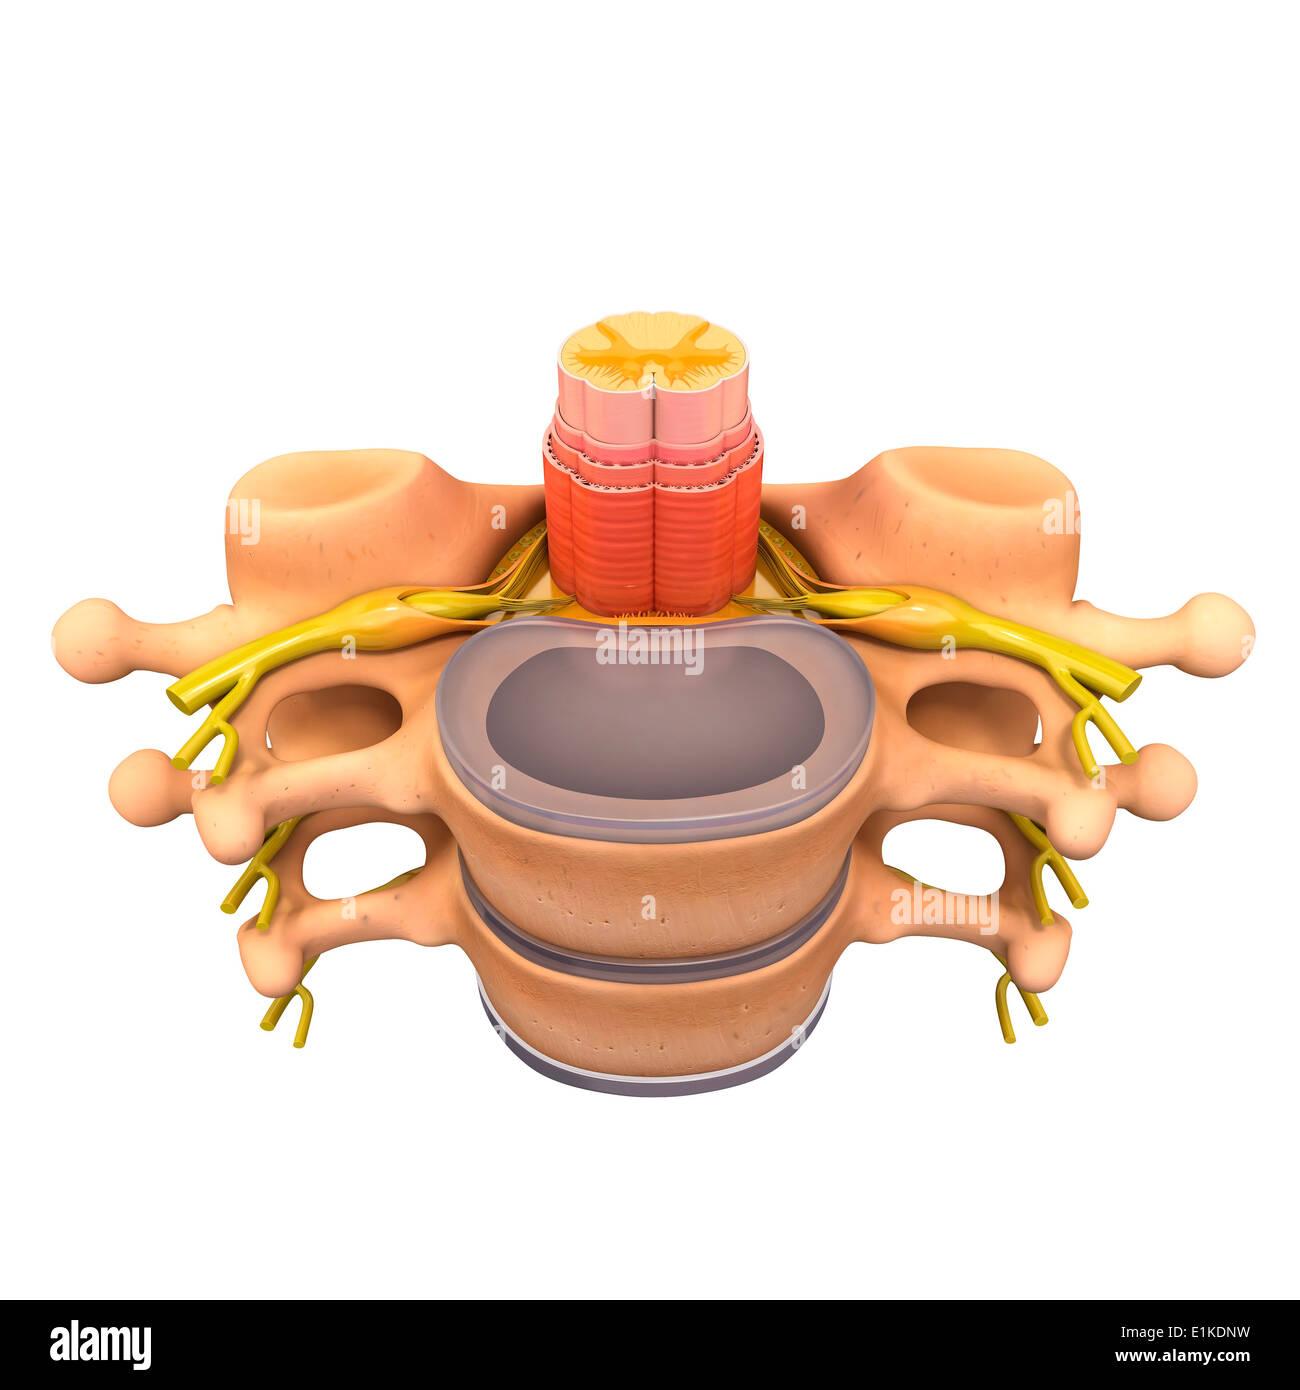 Human vertebra computer artwork. - Stock Image